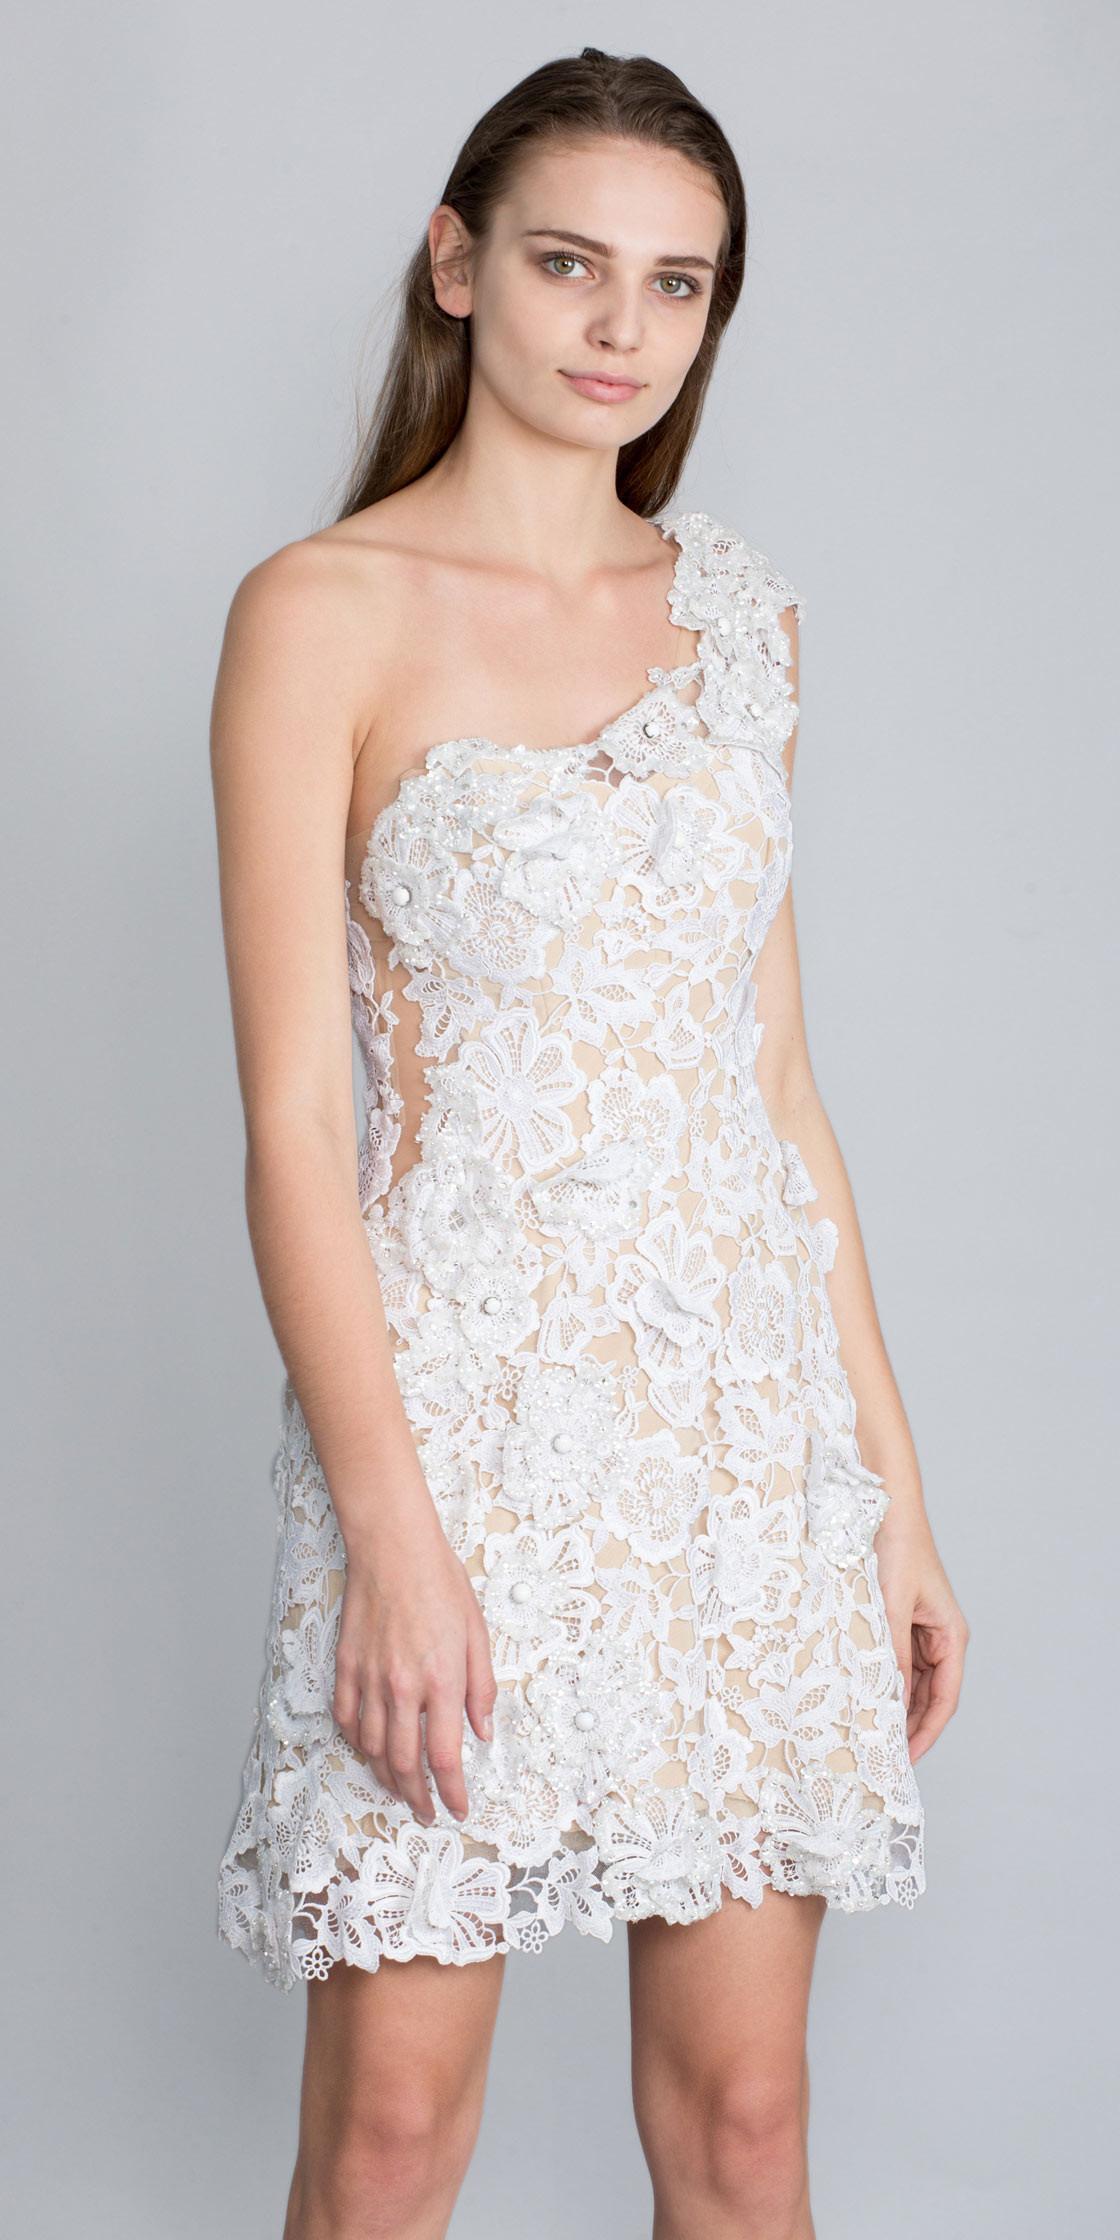 Rouba Maukadem Dantelle Dress